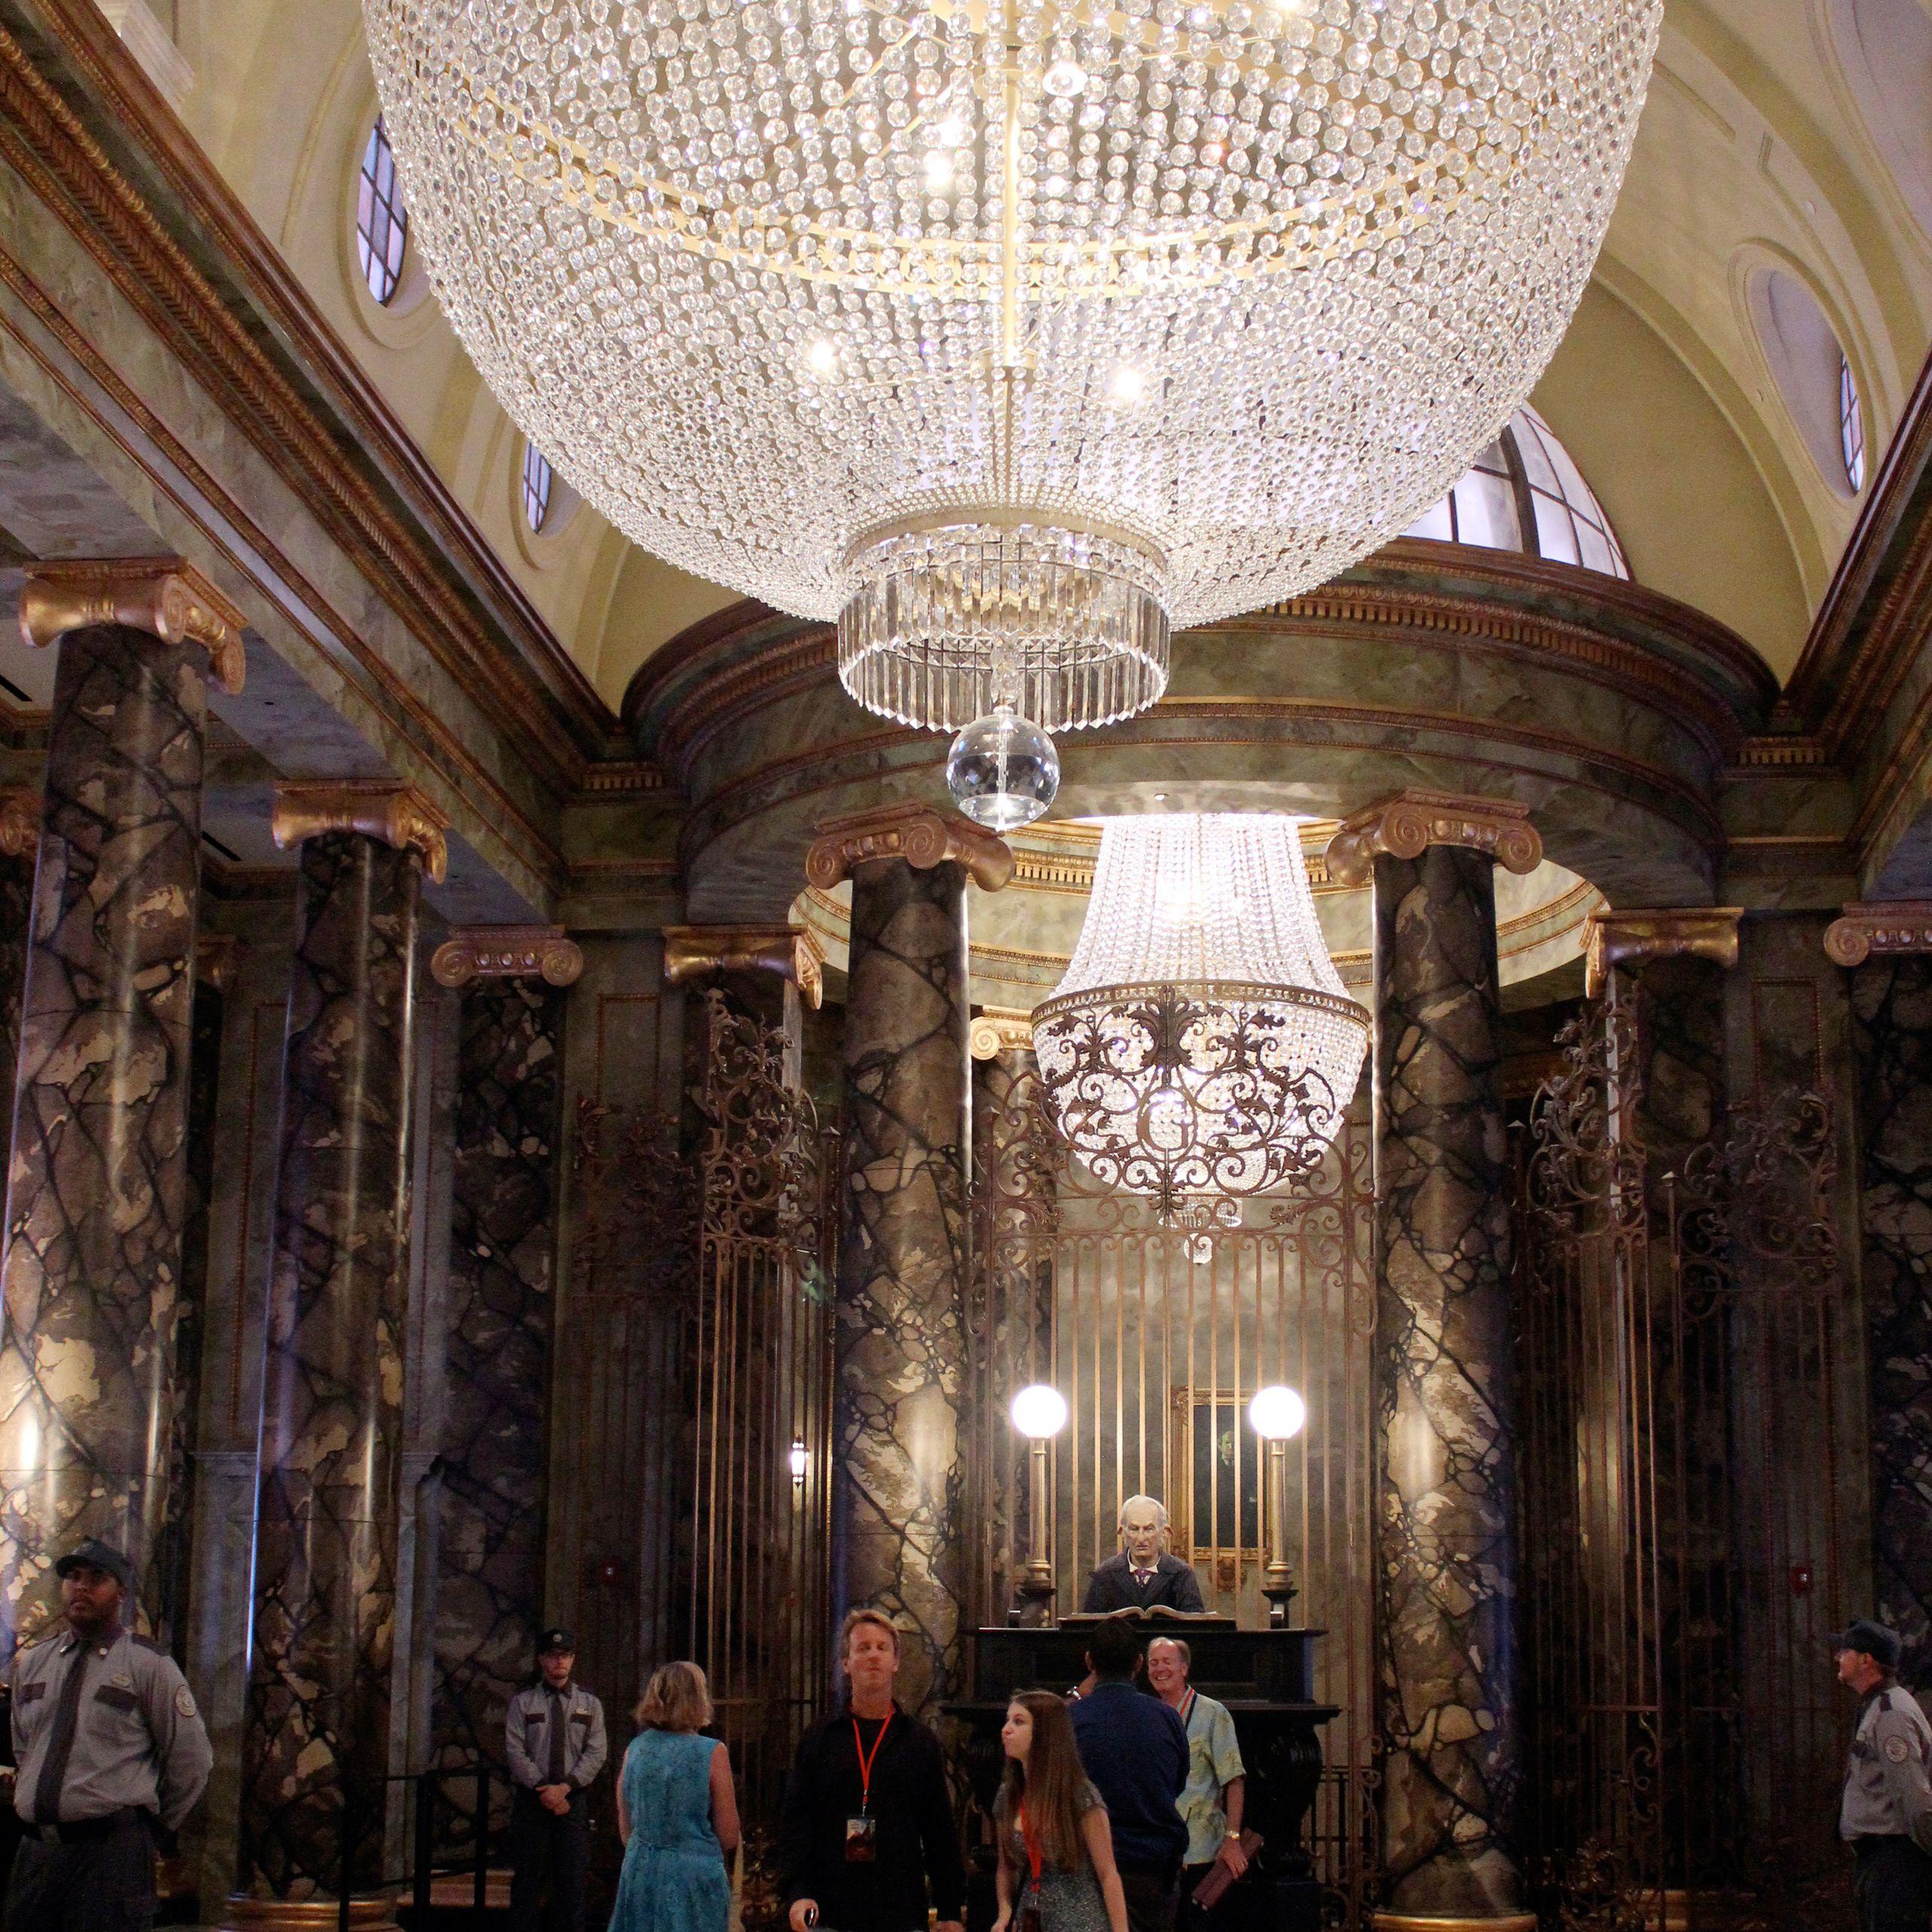 Gringotts-Bank-Lobby.jpg